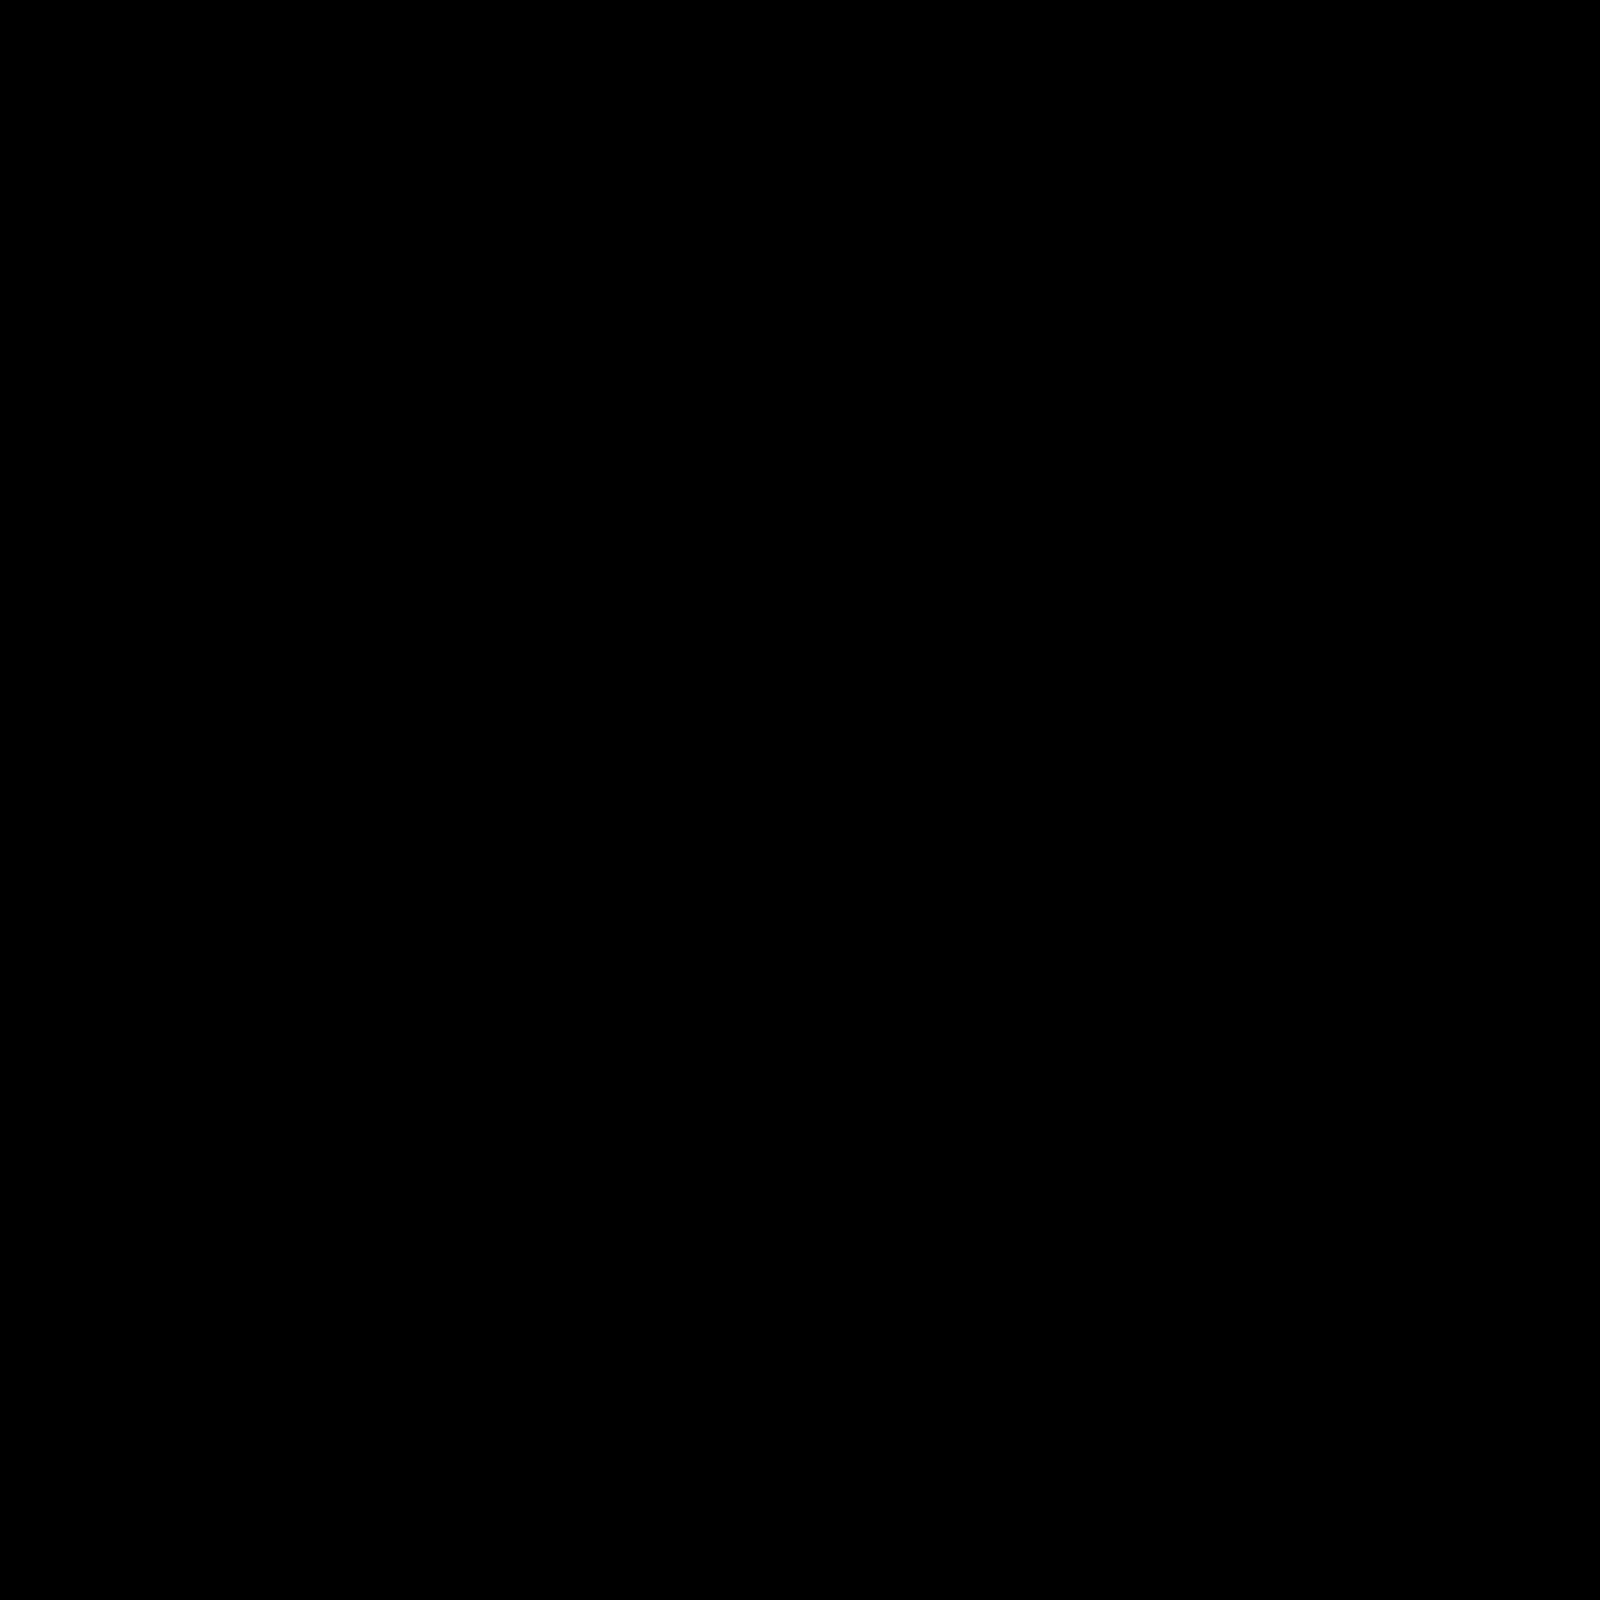 Zakreślone B icon